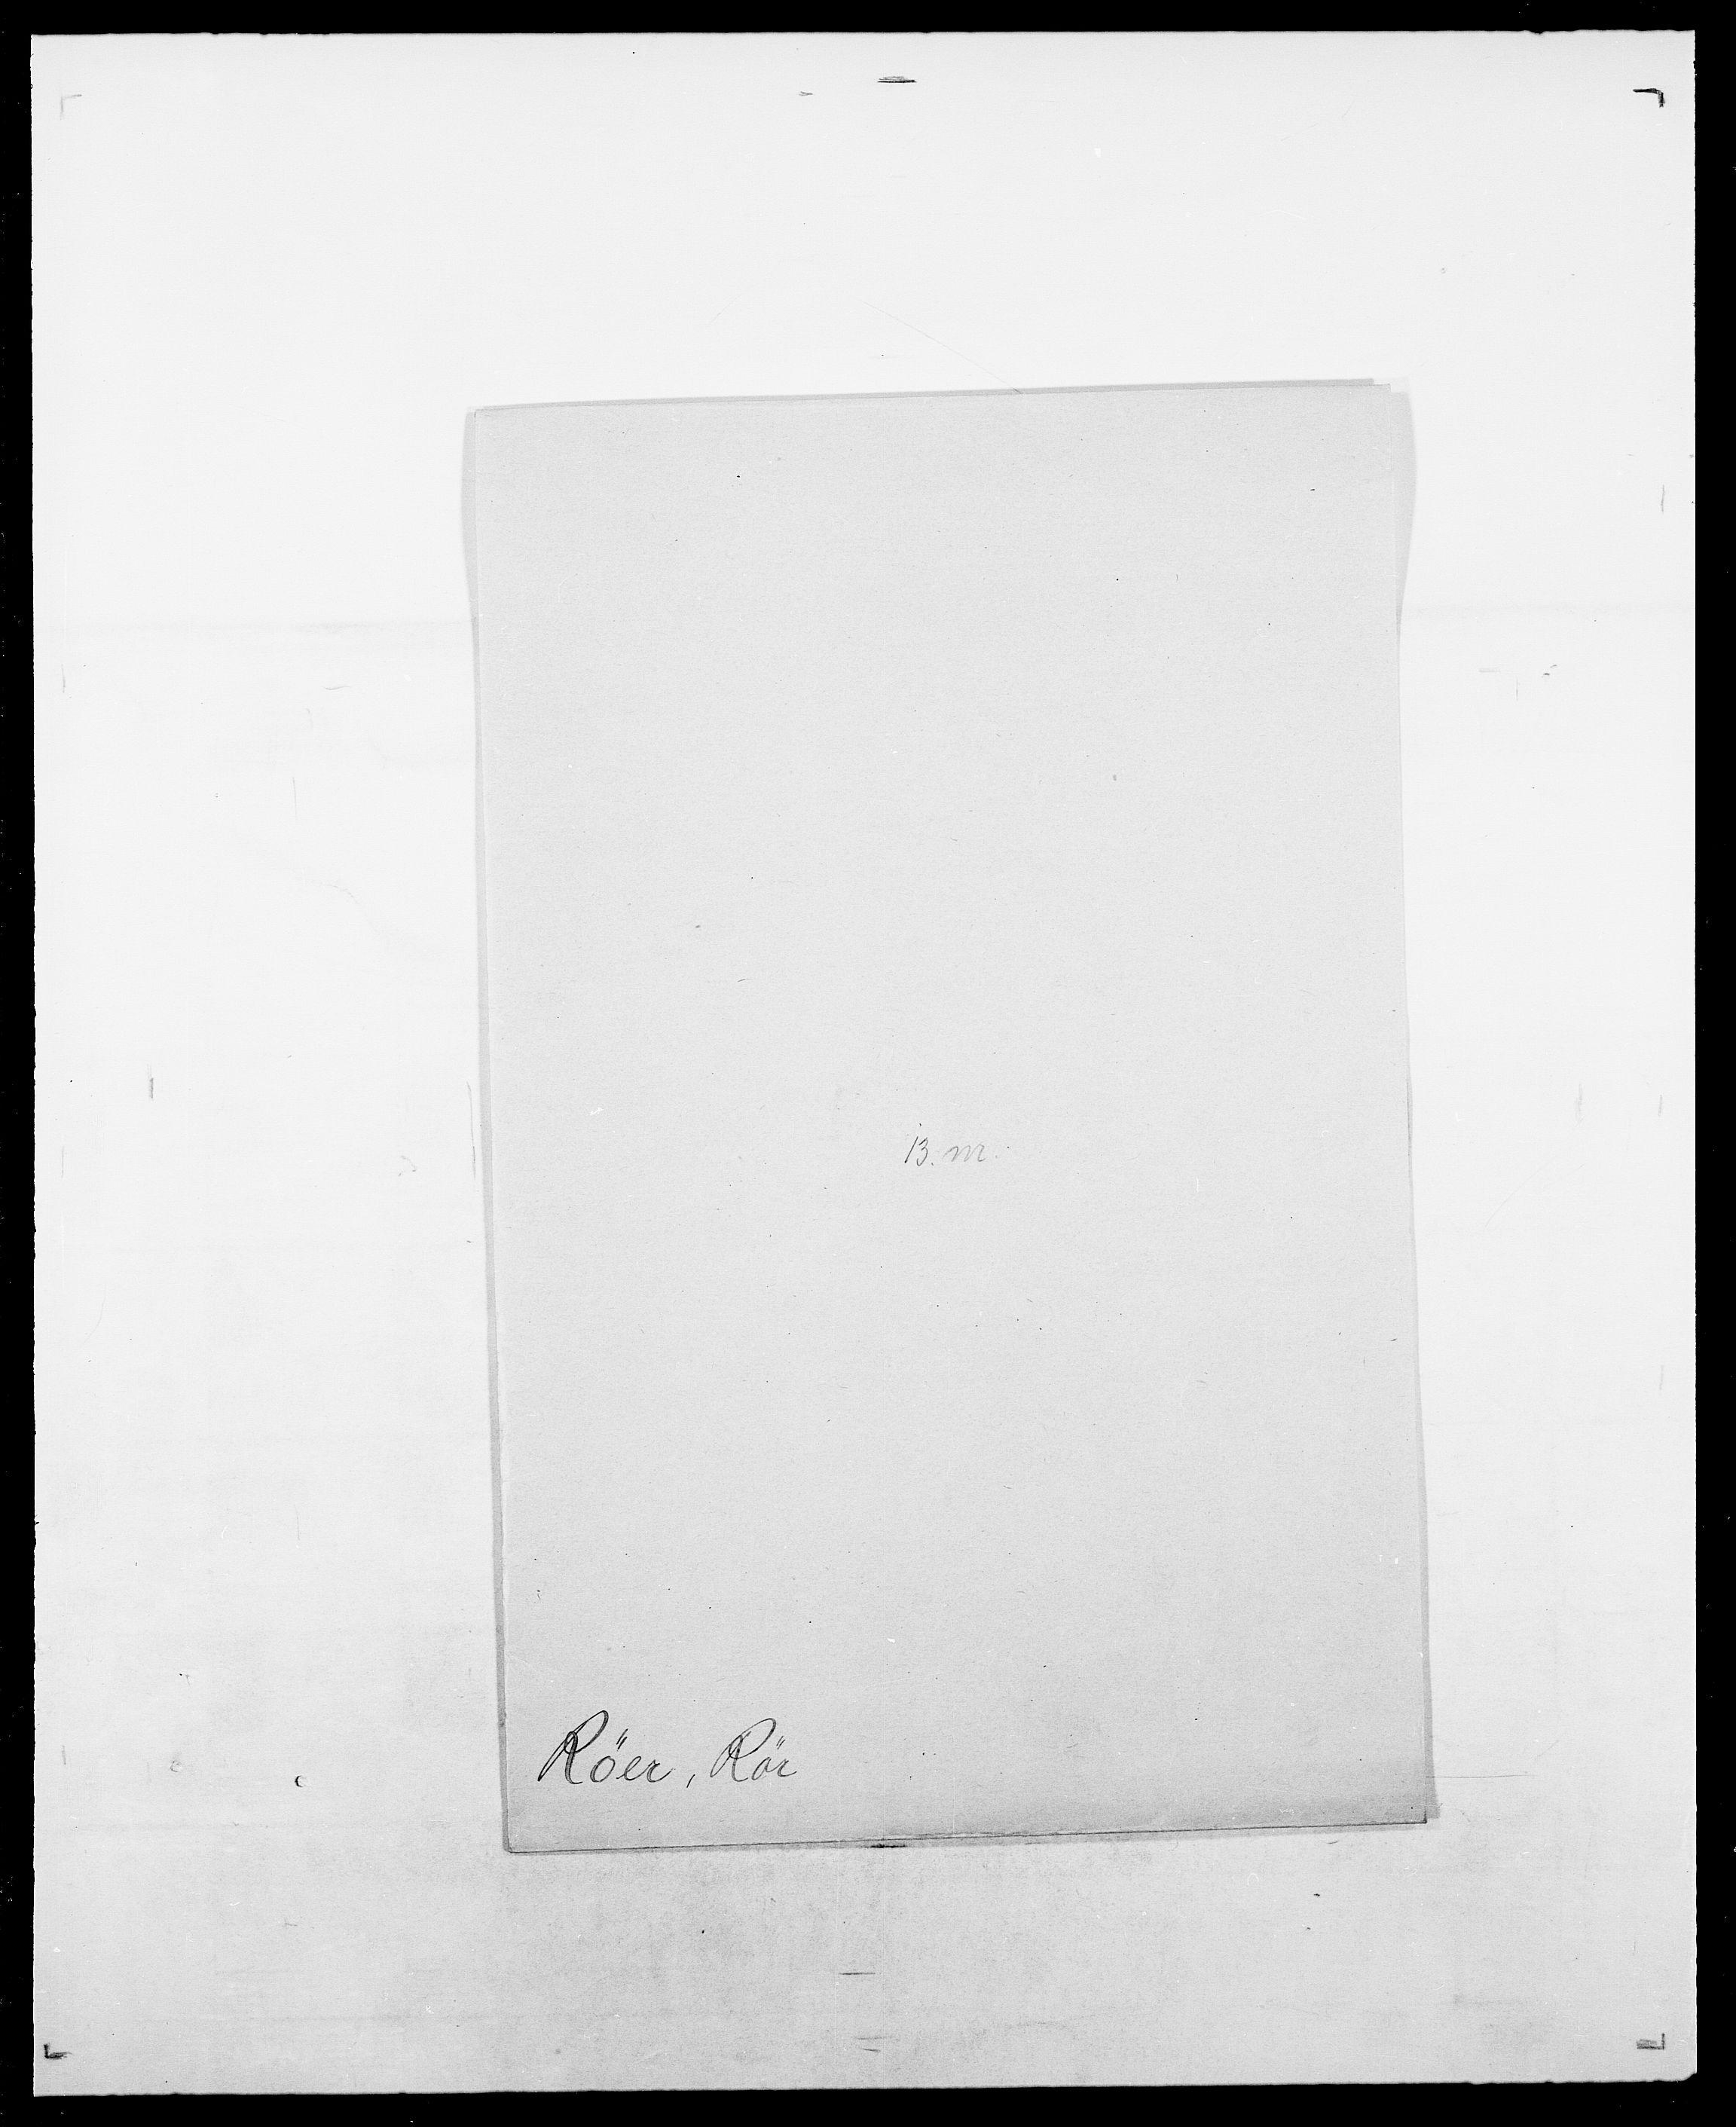 SAO, Delgobe, Charles Antoine - samling, D/Da/L0033: Roald - Røyem, s. 669